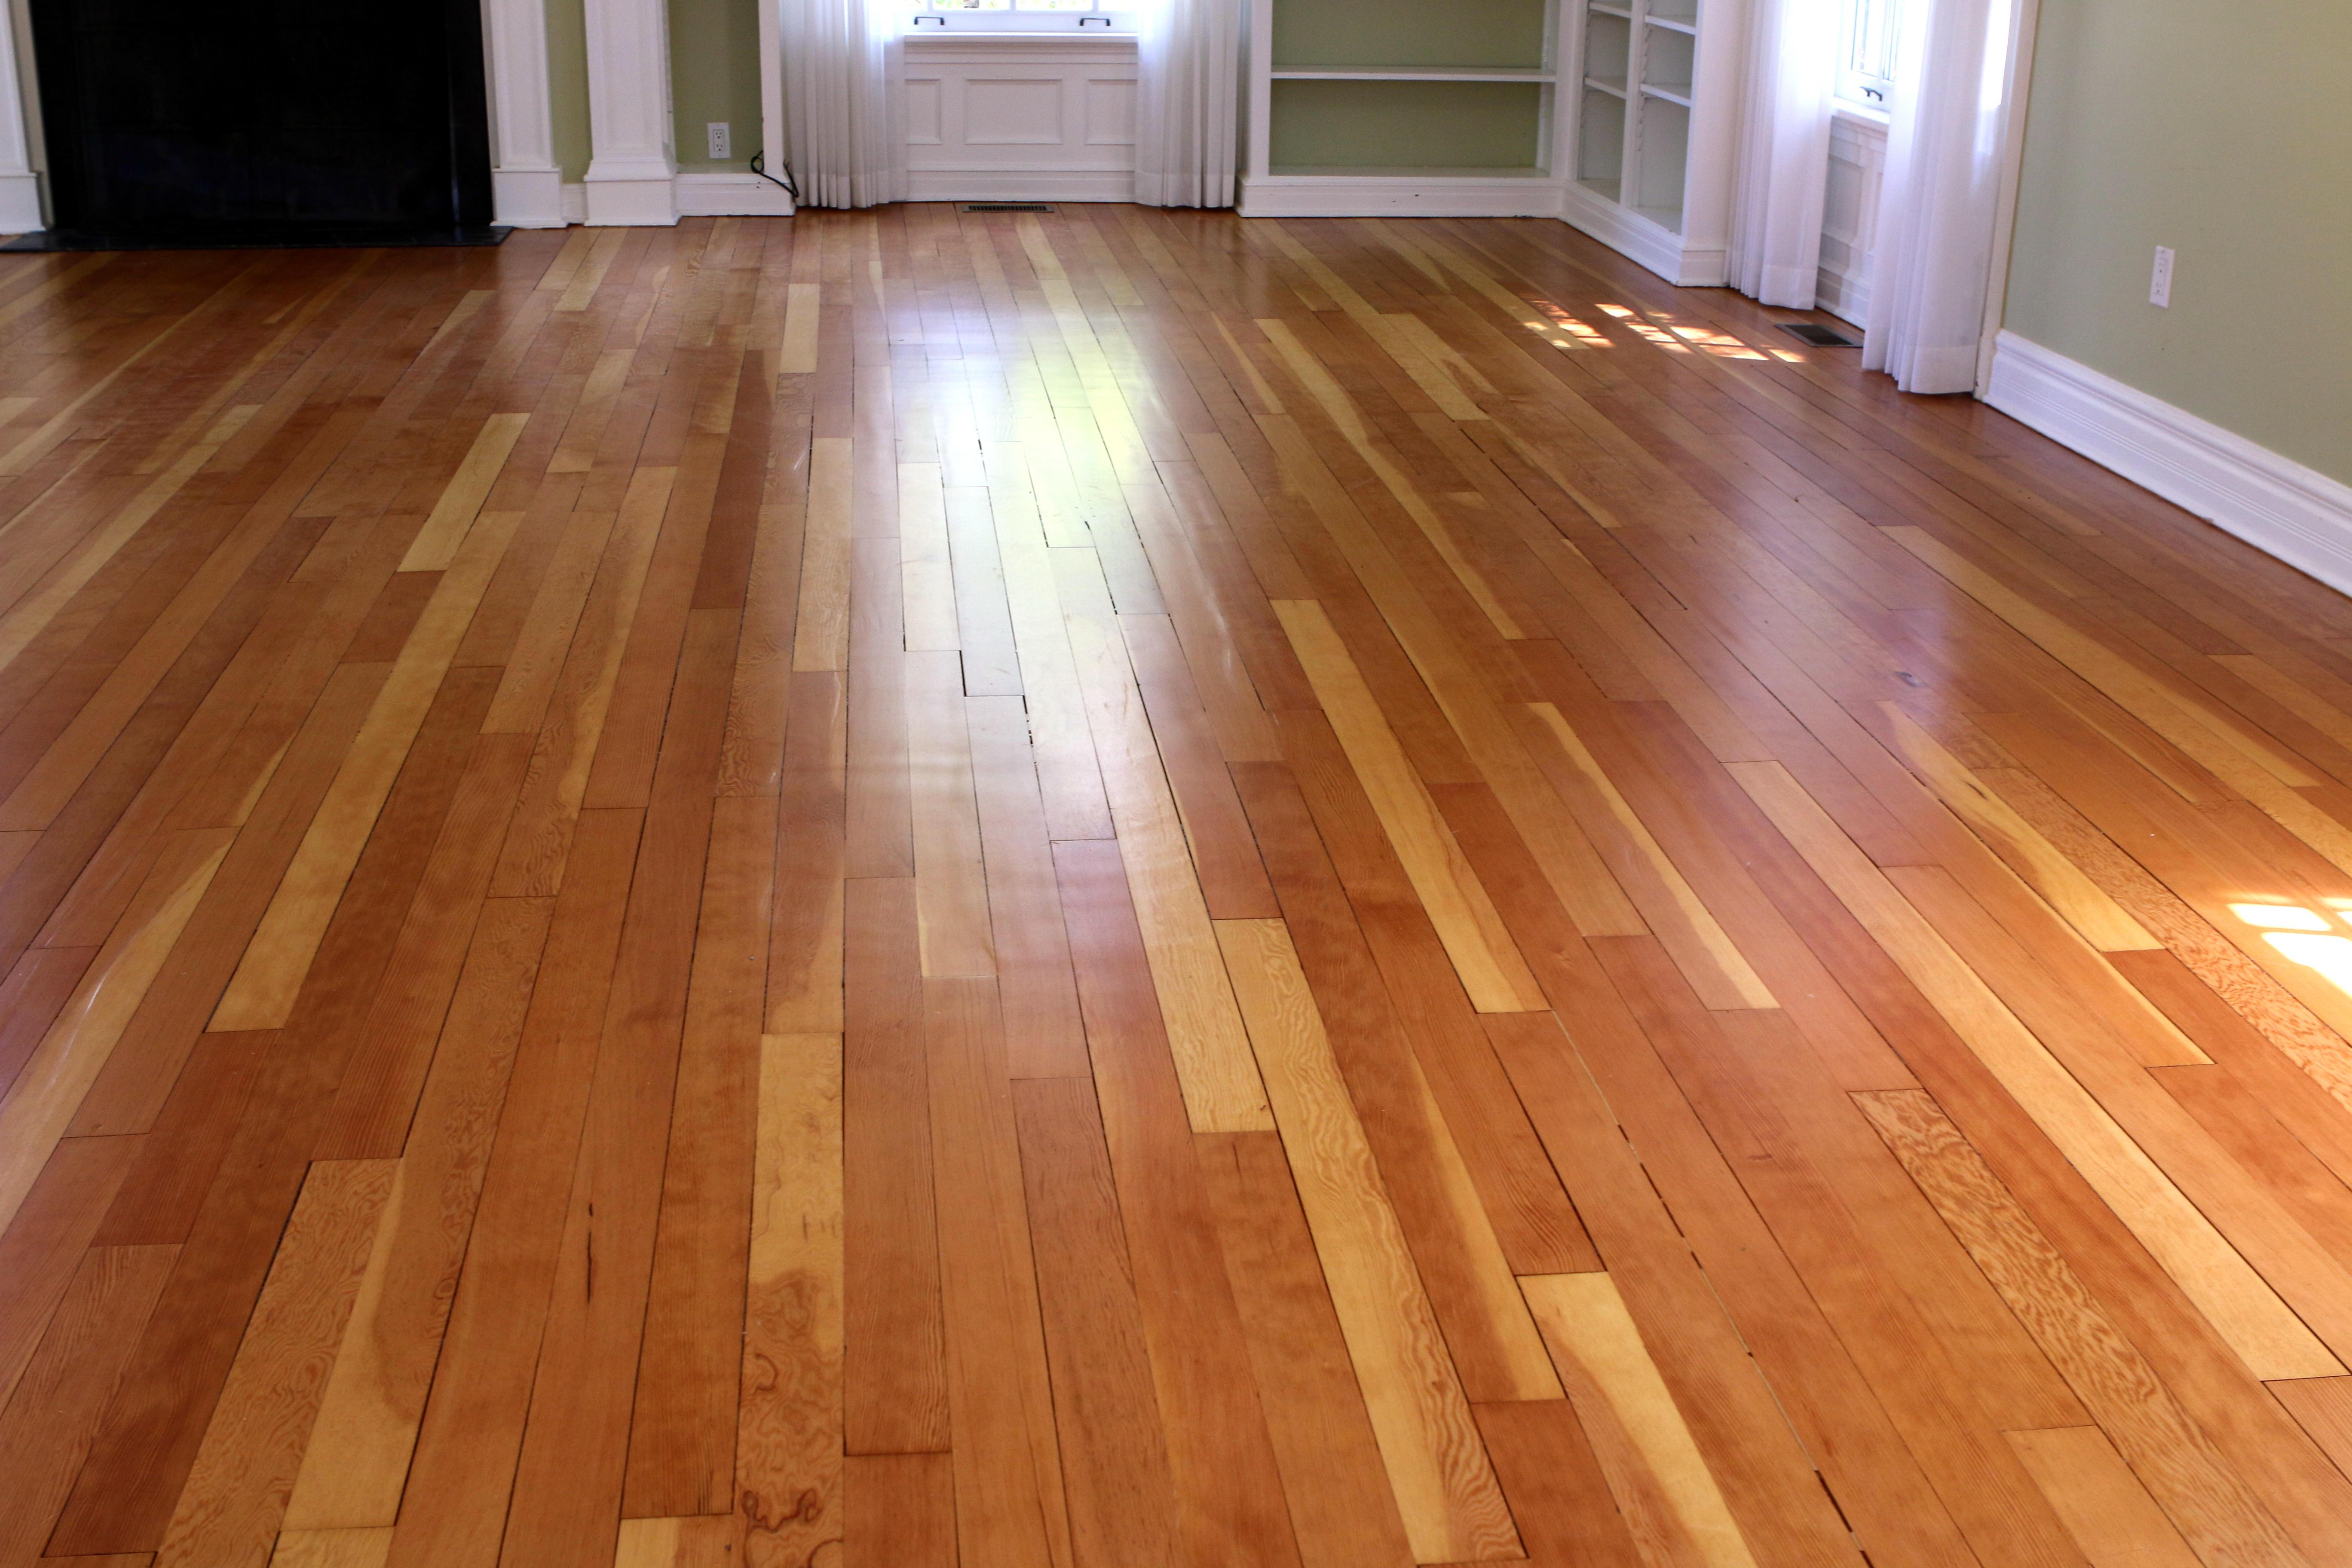 Practical Renovations Wood floors image 2